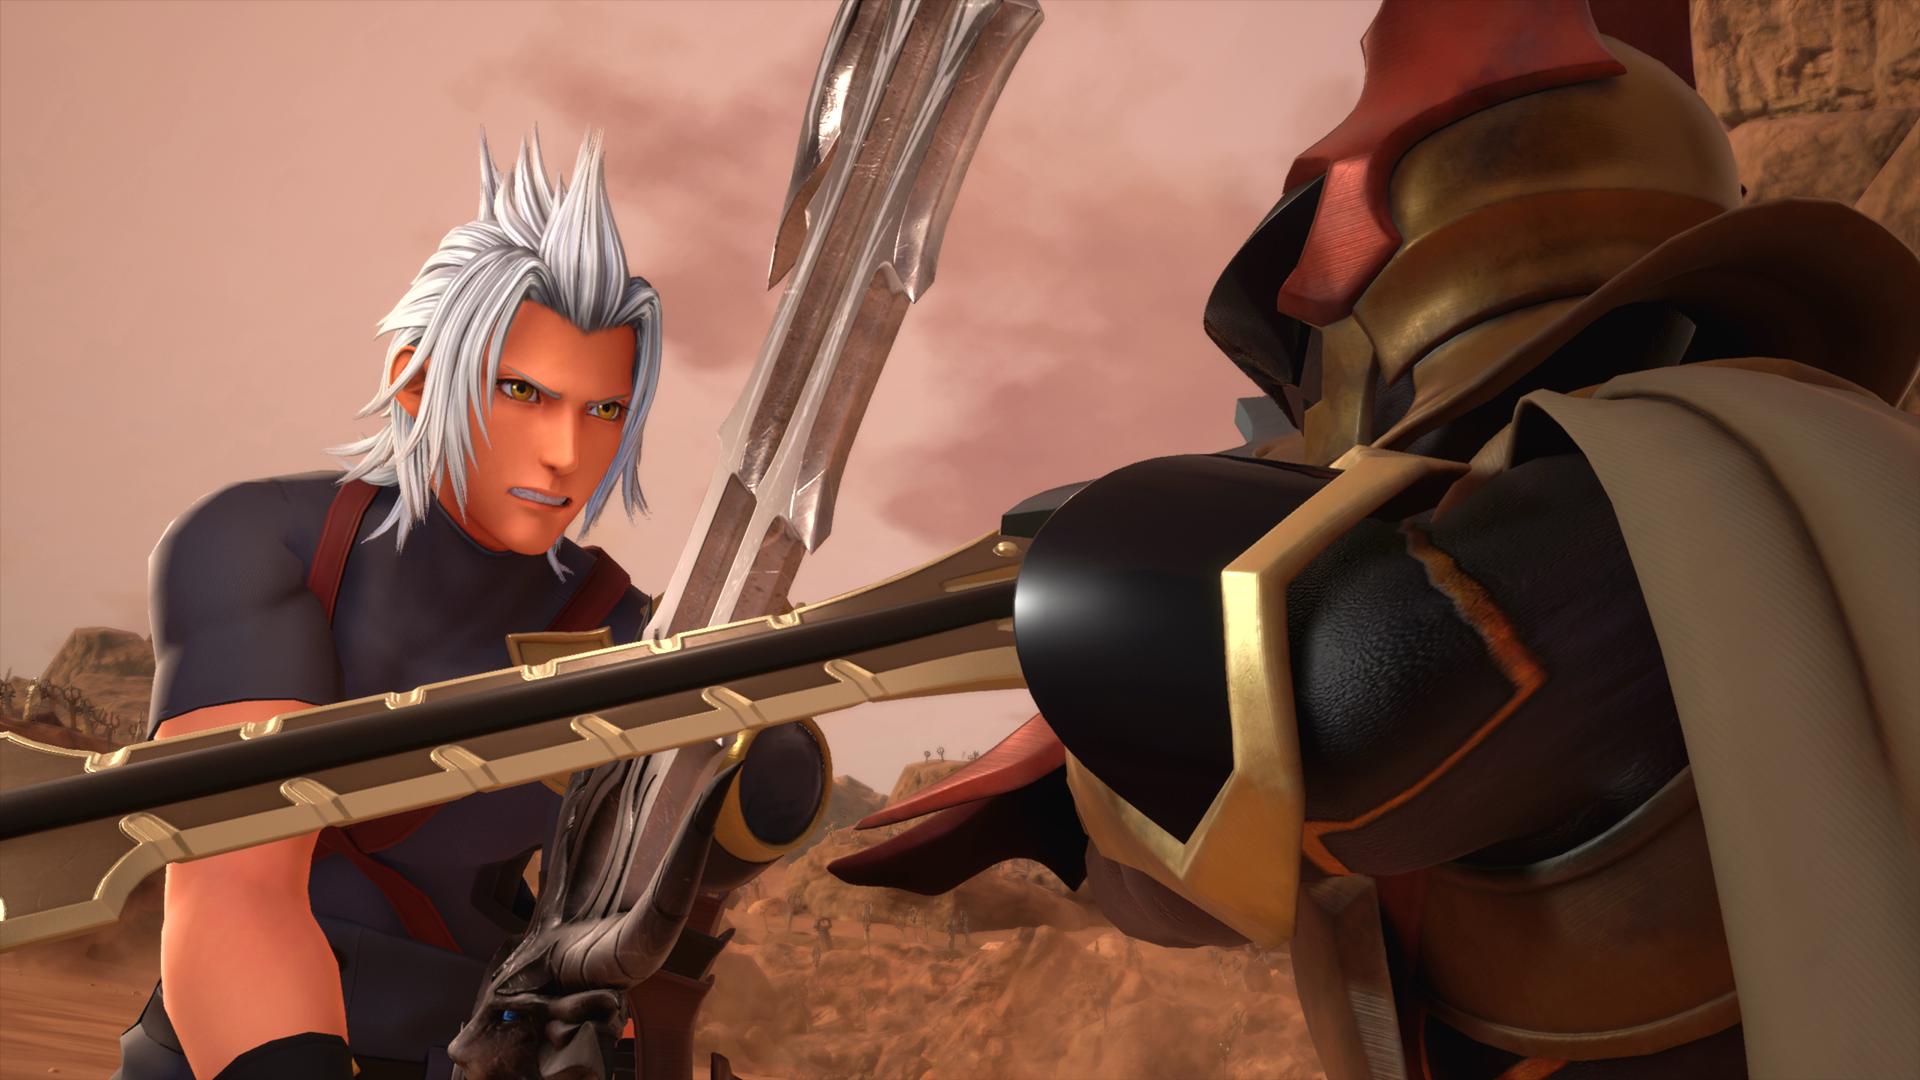 Kingdom Hearts Iii Hd Wallpaper Background Image 1920x1080